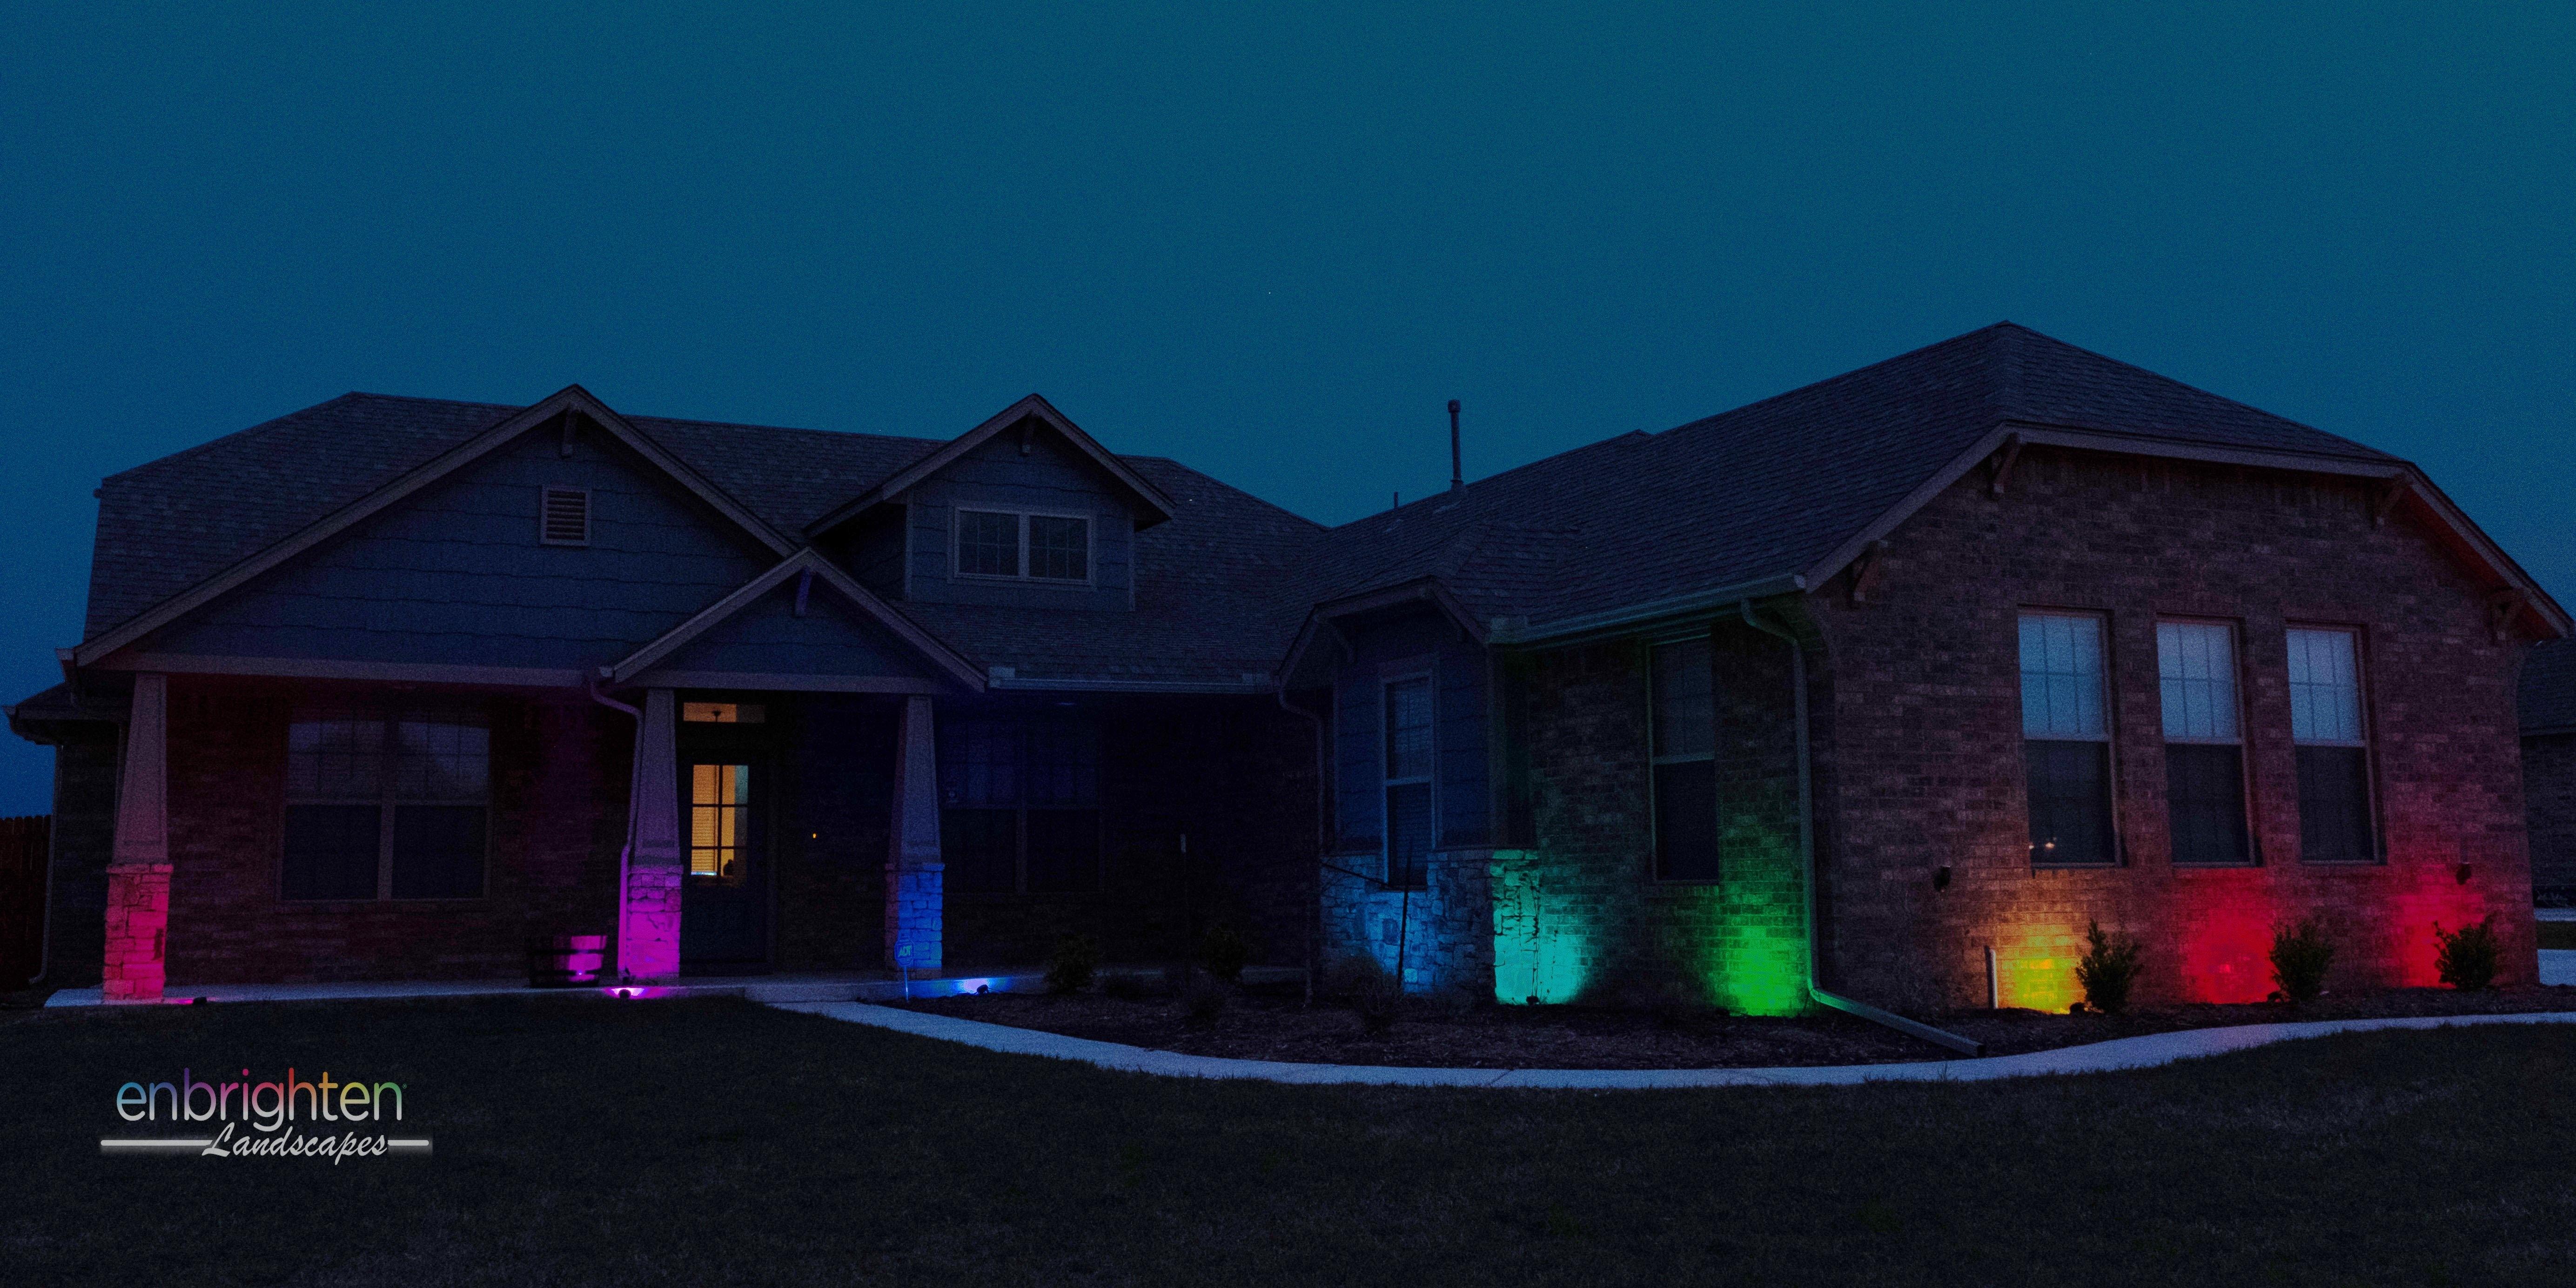 Multicolored-Enbrighten-Landscape-Lights-in-Flowerbed-614556-edited